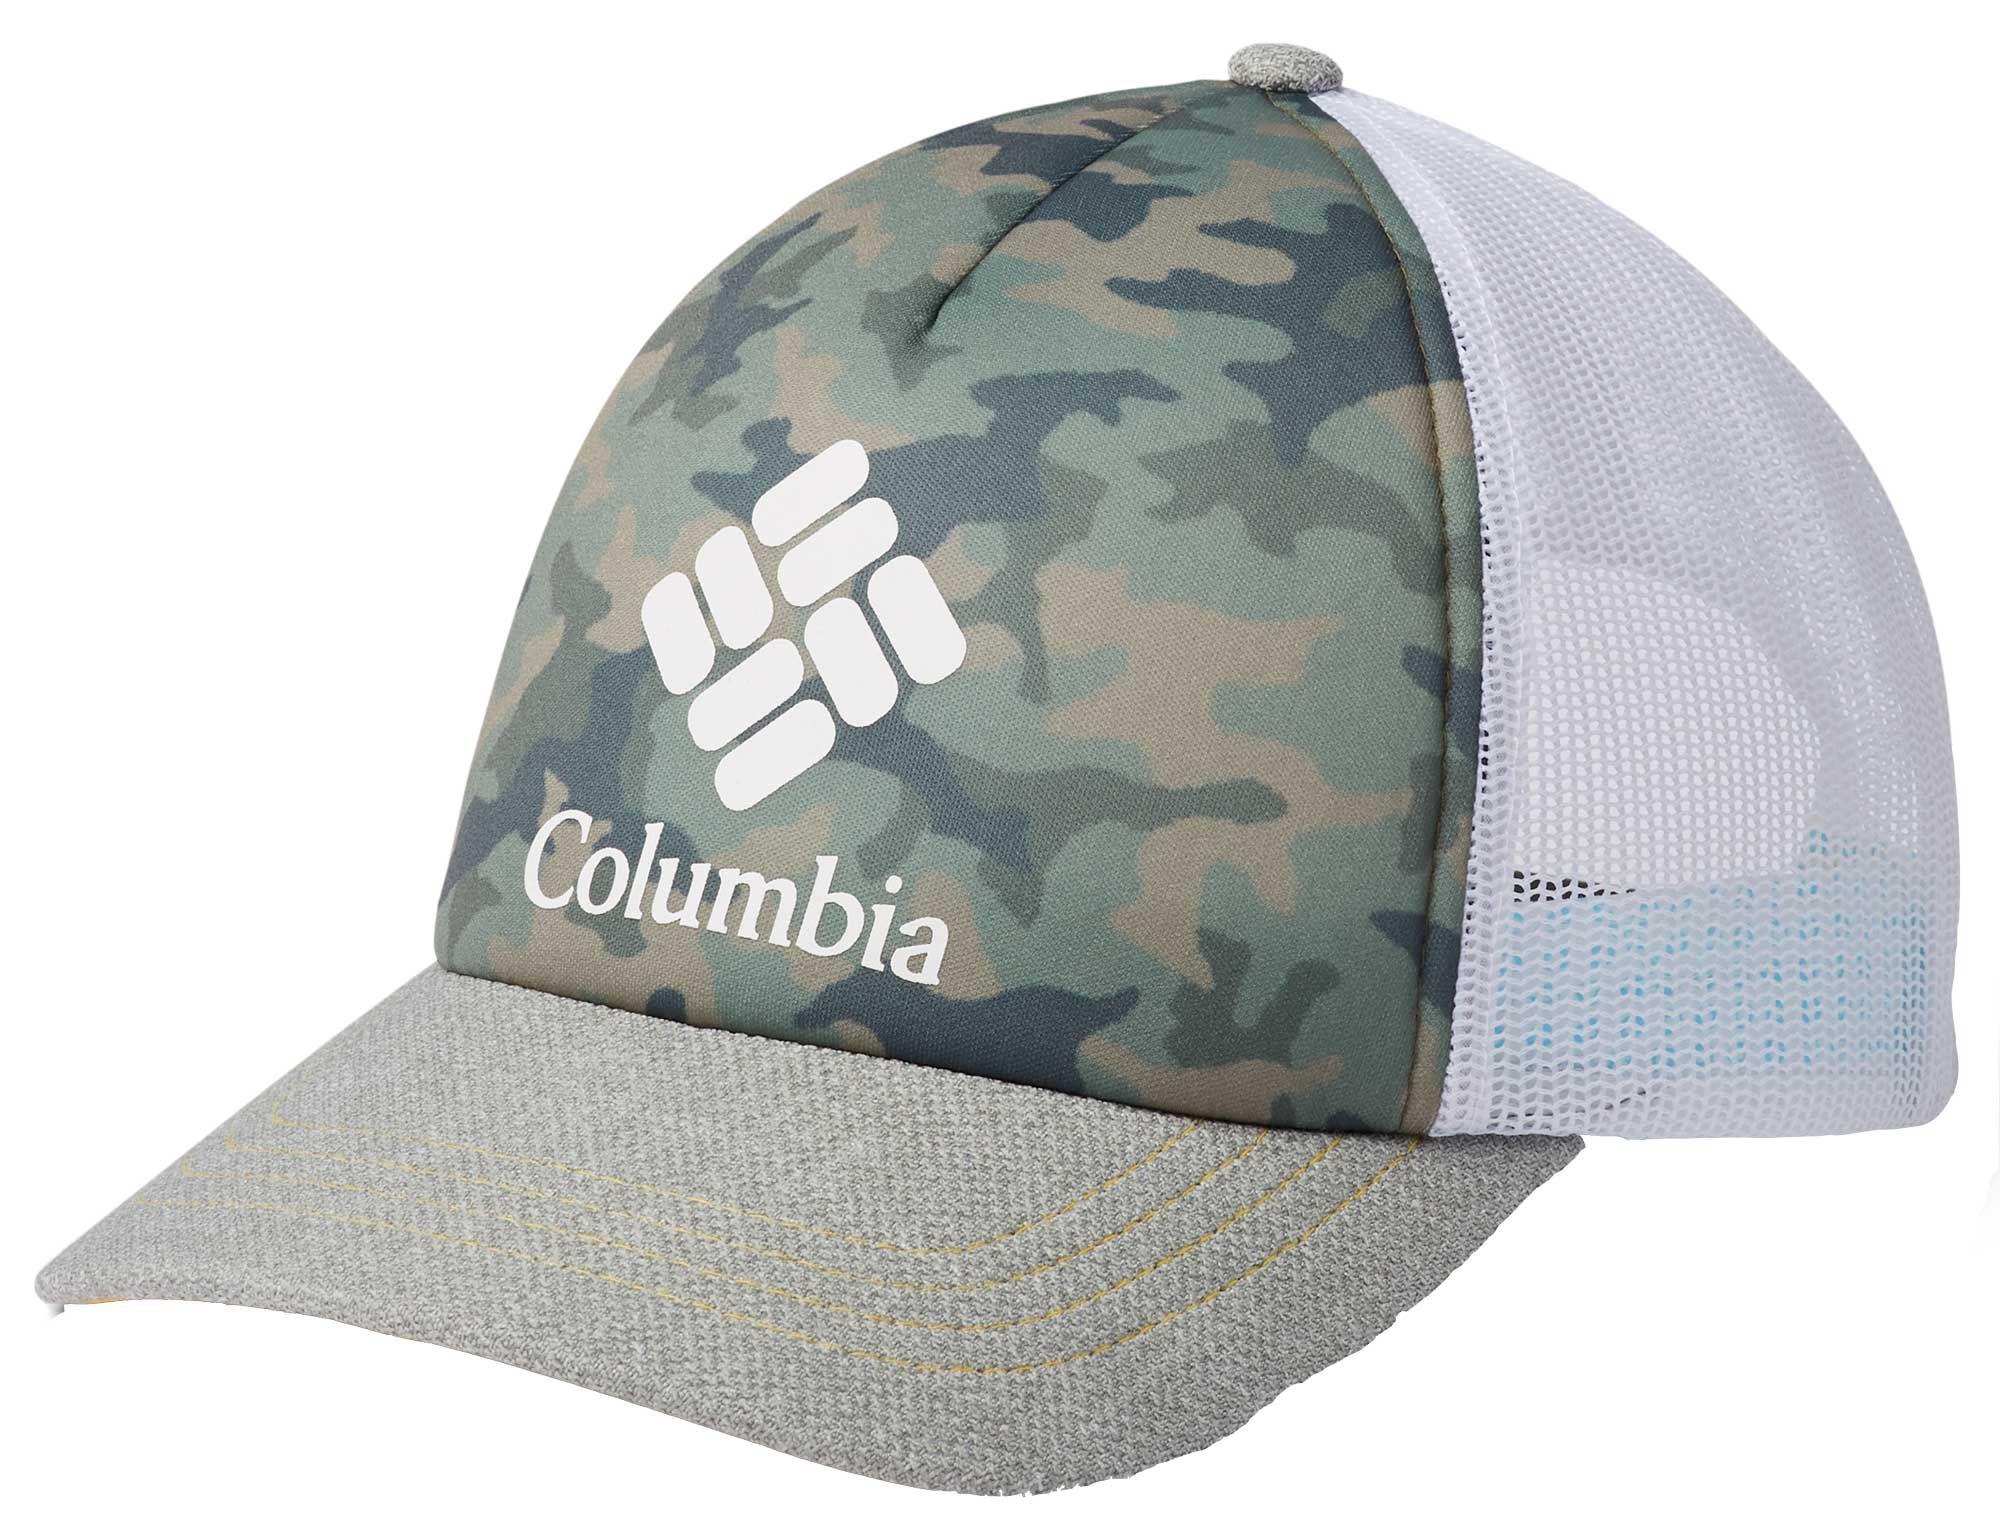 Columbia Women's Mesh II Hat, Size: One size, Cypr Camo/Col Gy Hetr/Wht thumbnail